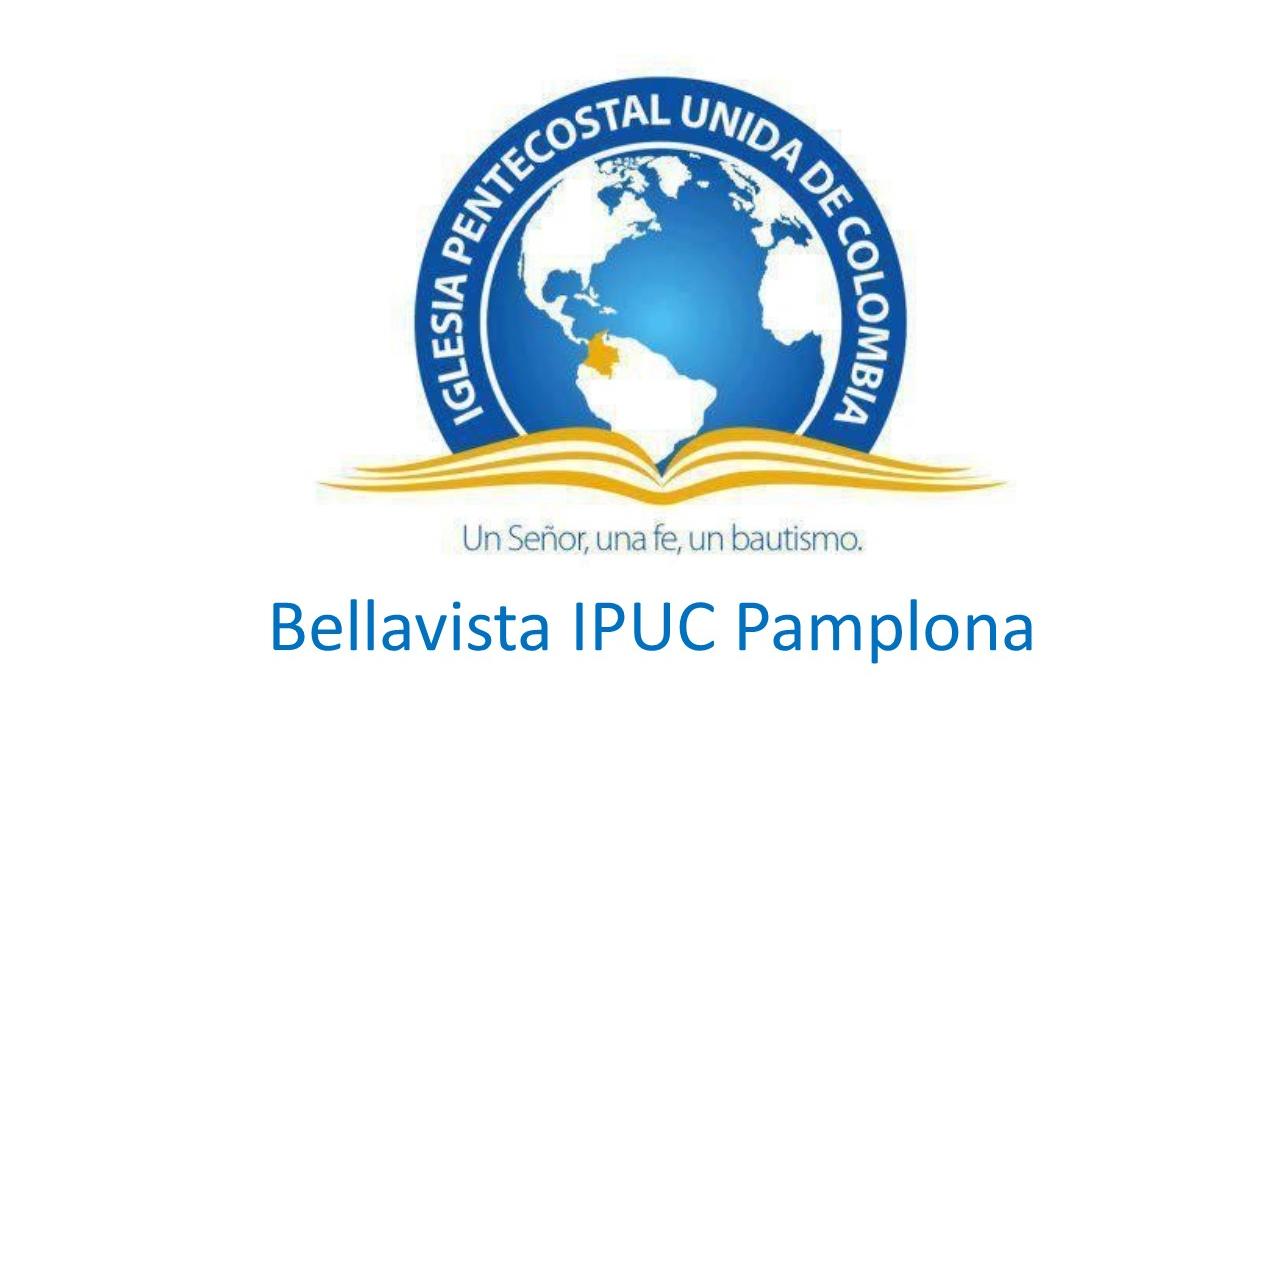 BellavistaI PUC Pamplona